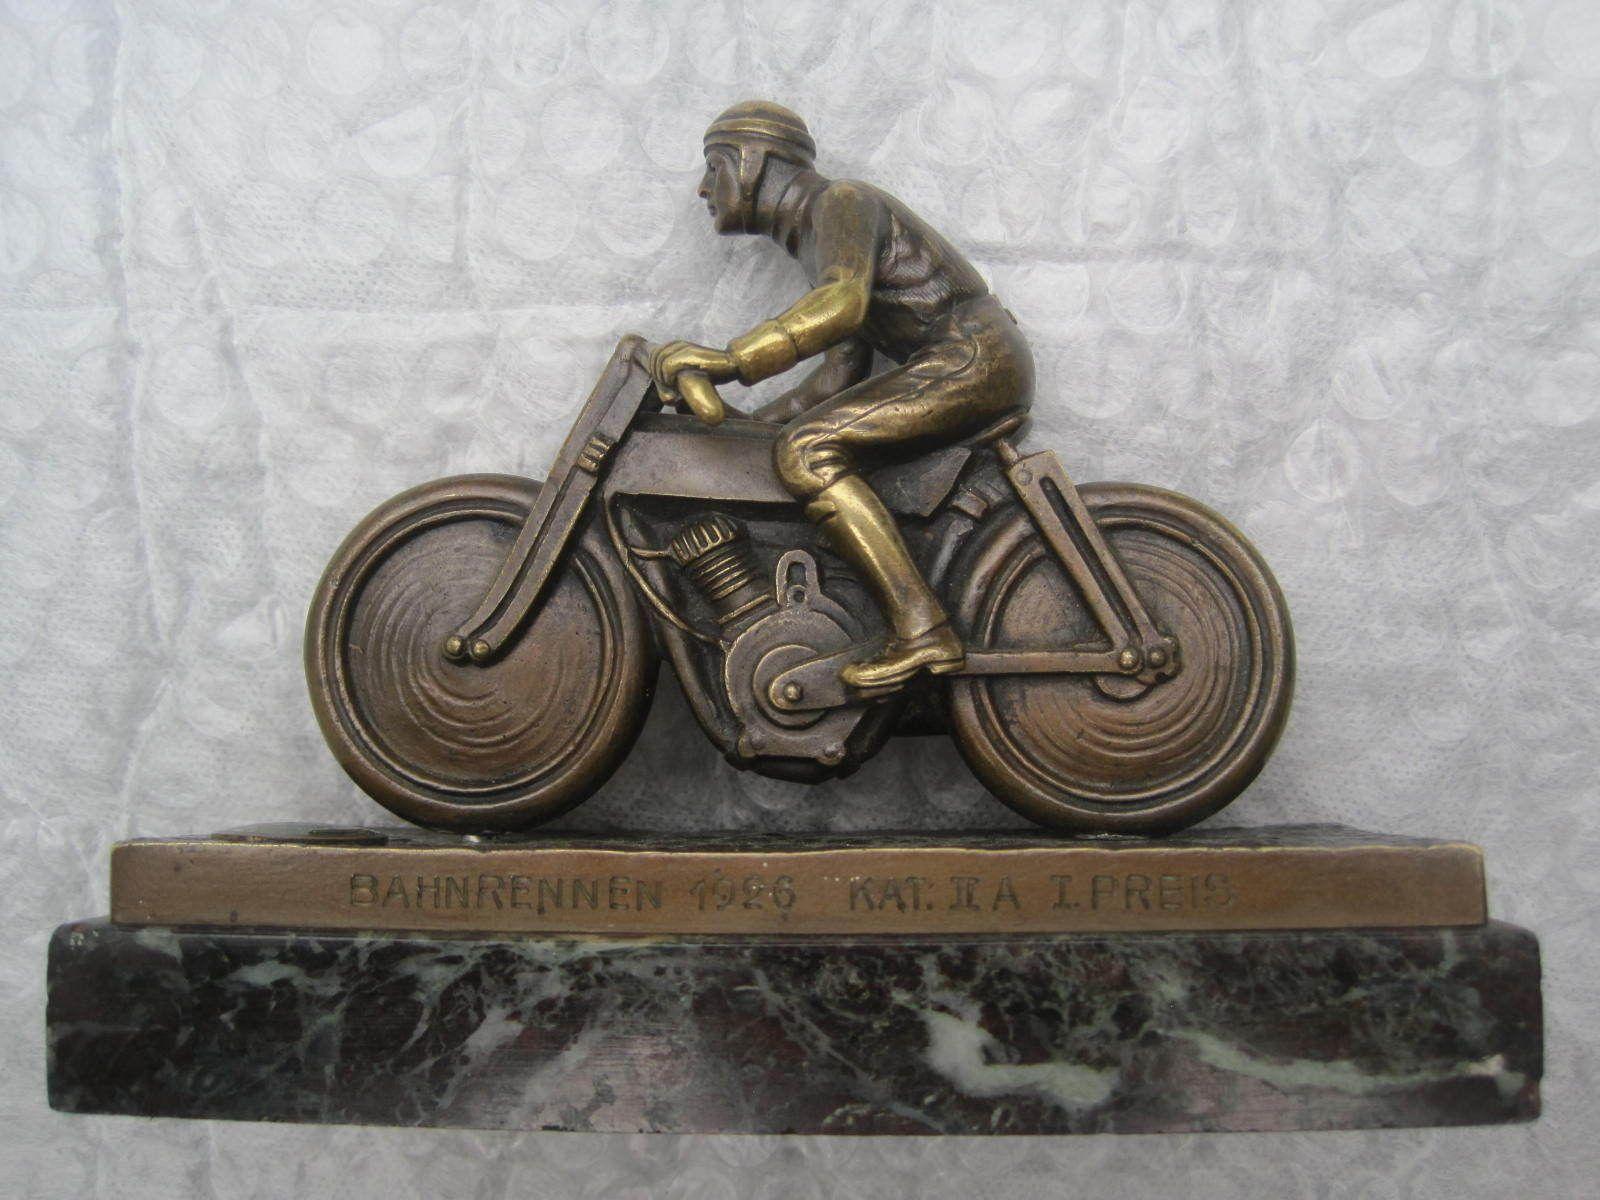 Track Races In 1926, Carl Bröse Motorcycle Bronze Sculpture